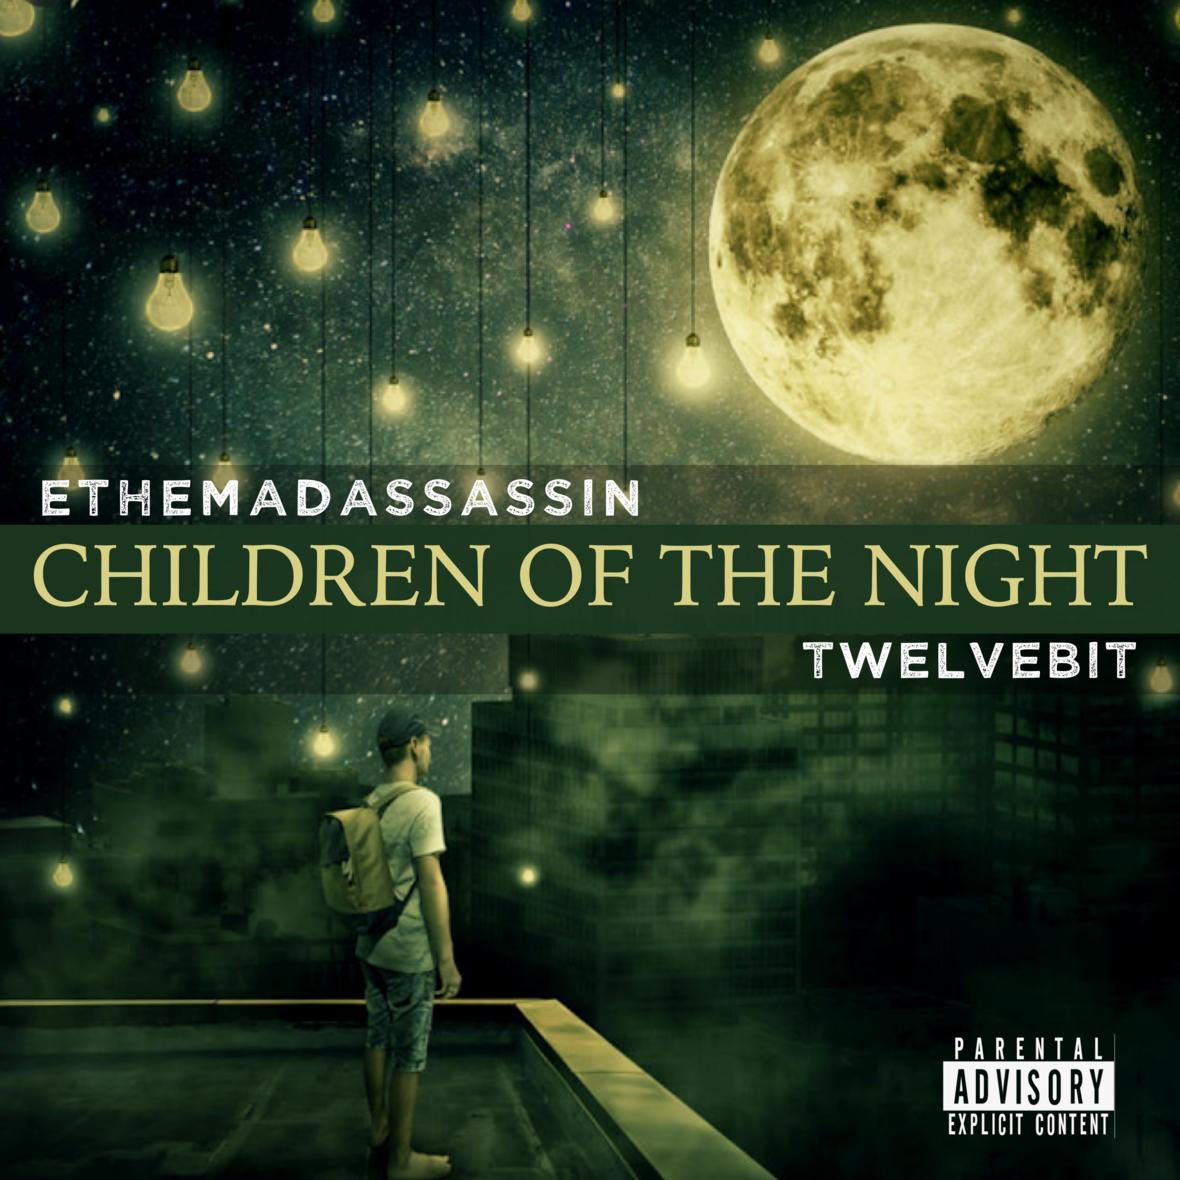 ethemadassassin - Children Of The Night | Official Video